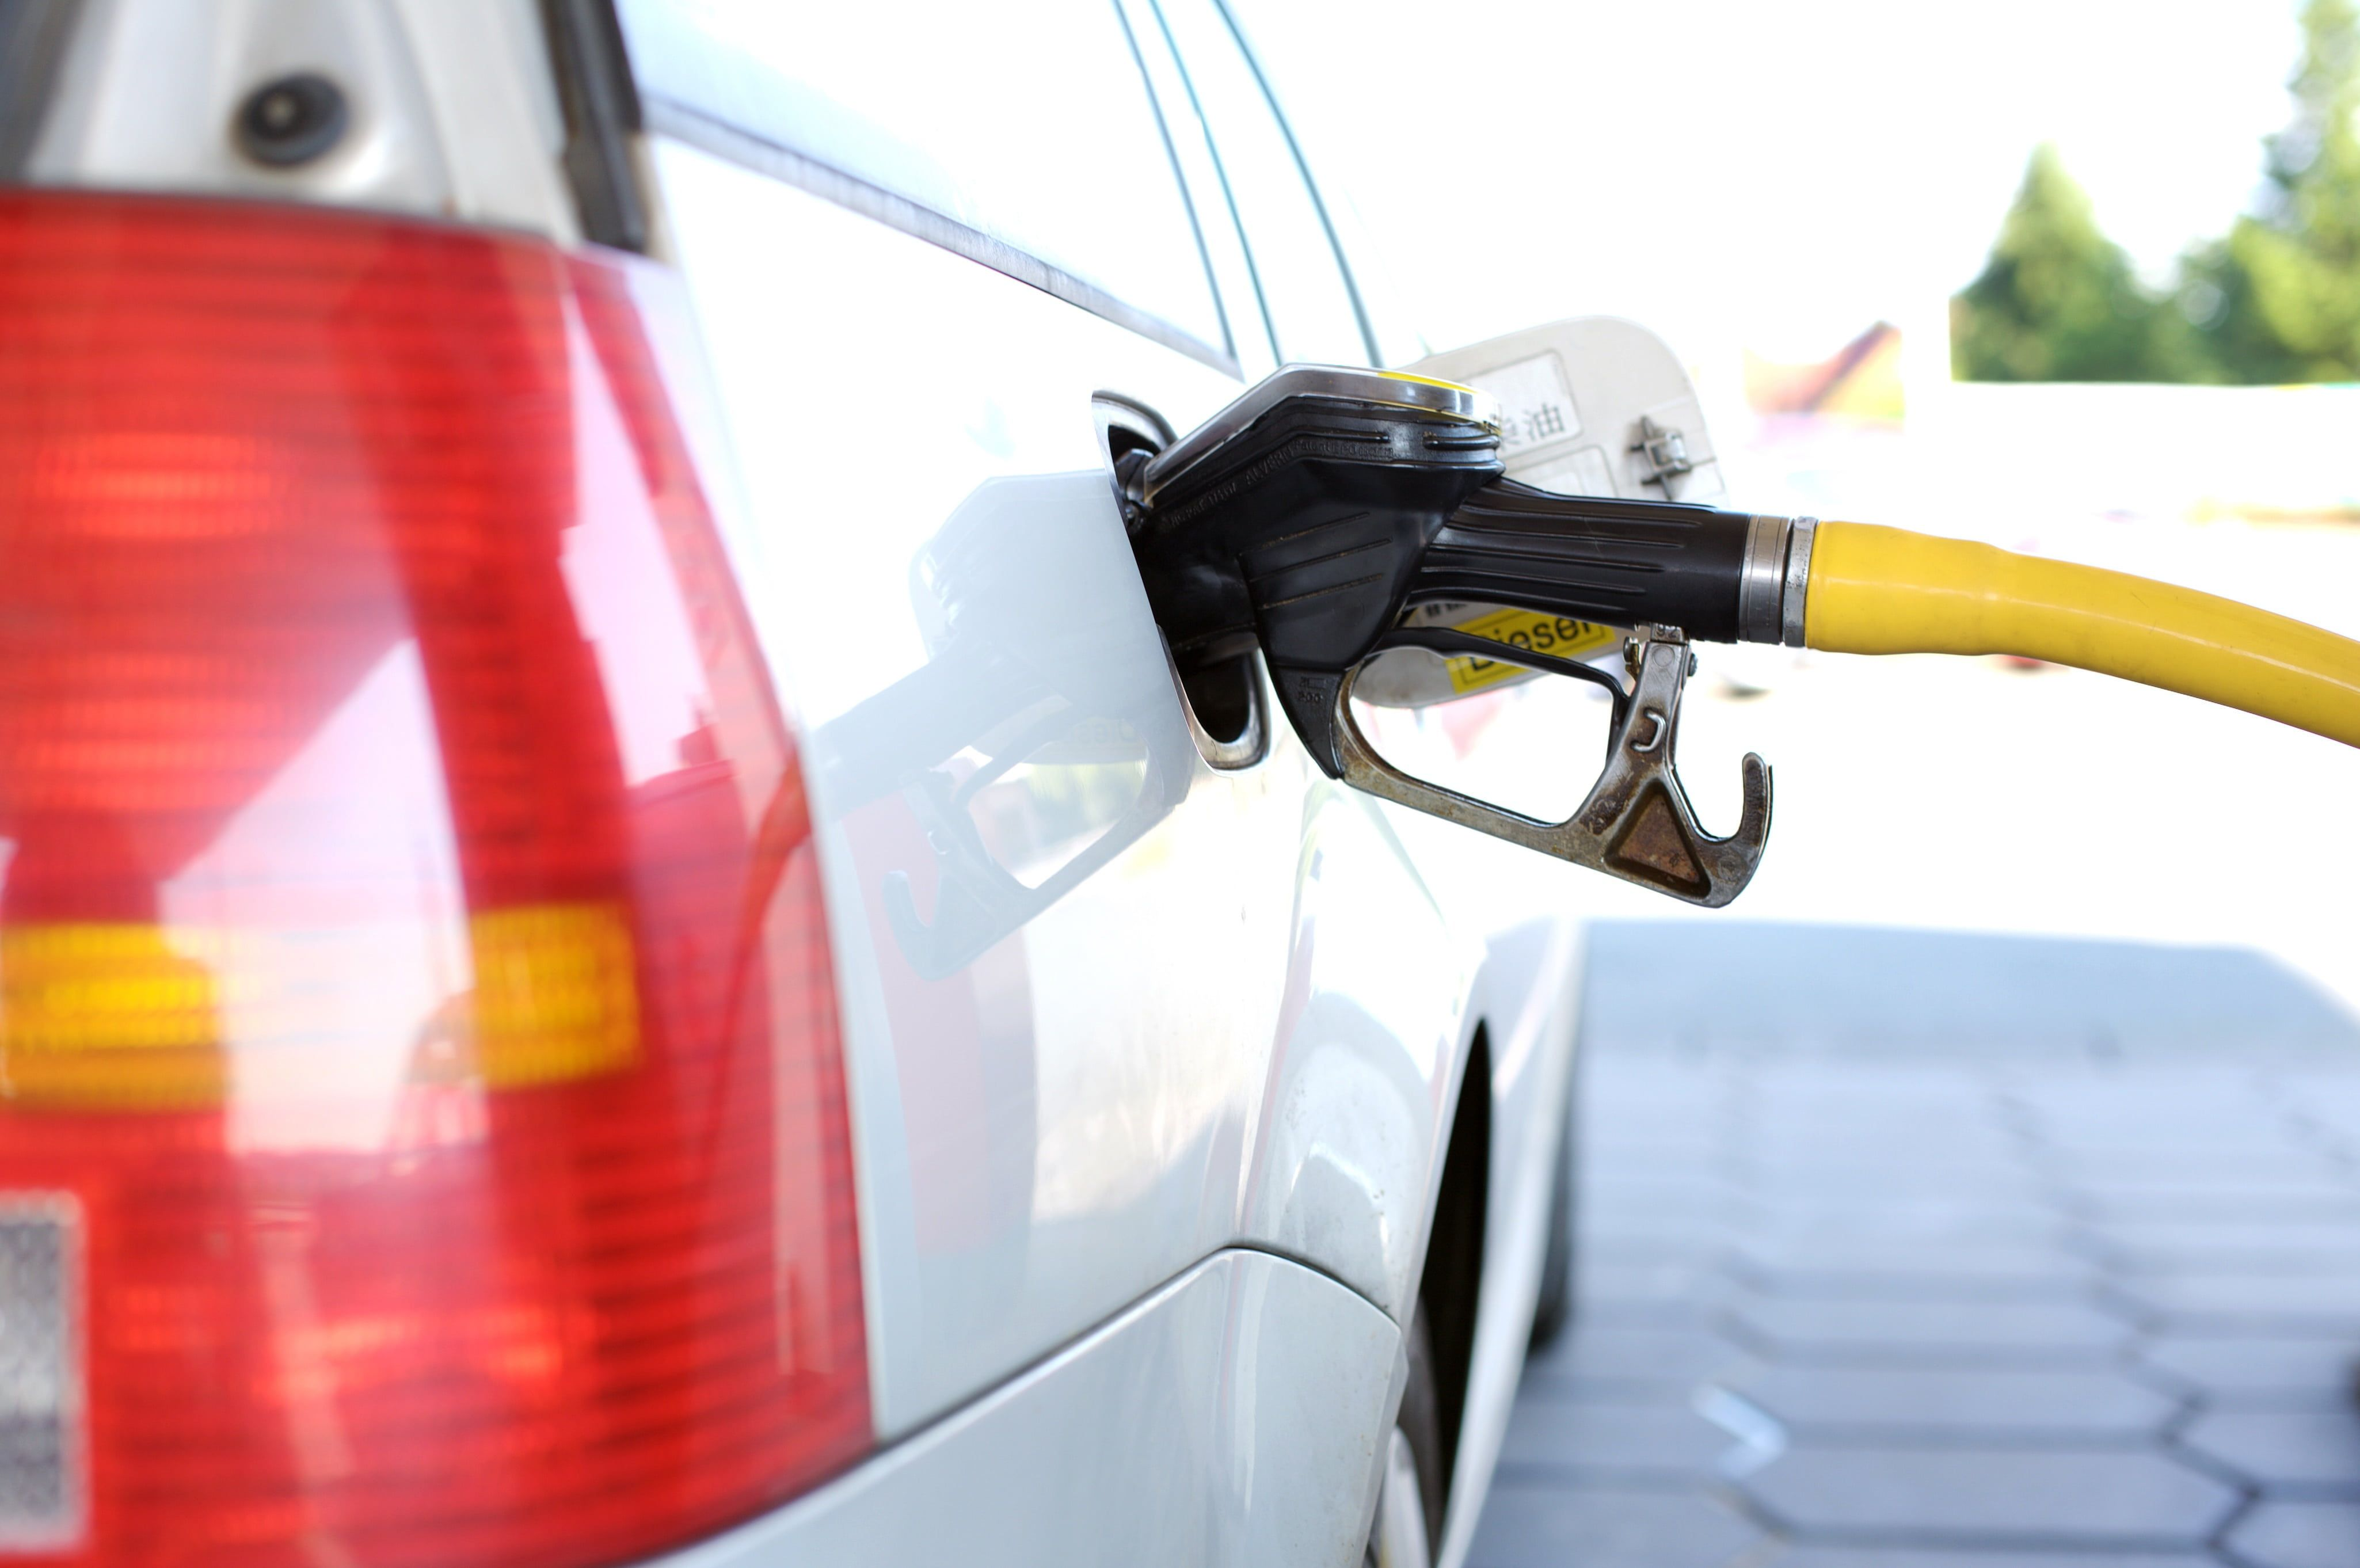 White Vehicle Filling Gas Tank Using Gasoline Pump Refuel Petrol Stations Gas Pump Petrol Gas Auto Fue Hydrogen Fuel Cell Petrol Price Hydrogen Fuel